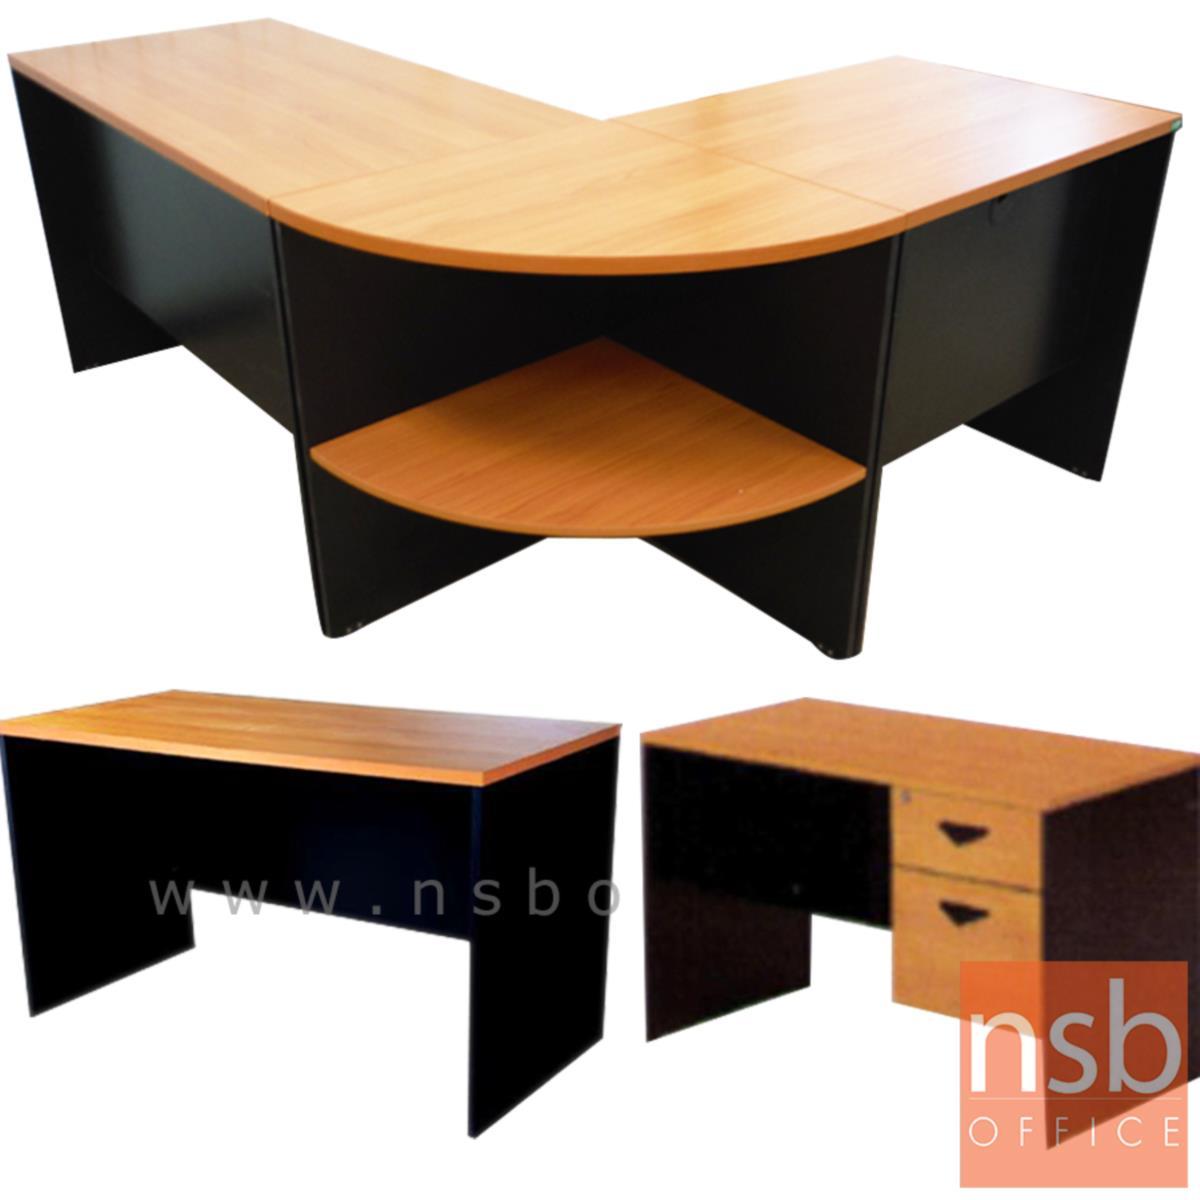 A16A018:โต๊ะทำงานตัวแอลชุด 3 ชิ้น รุ่น Timberlake (ทิมเบอร์เลก) ขนาด 180W1*140W2 cm. เมลามีน